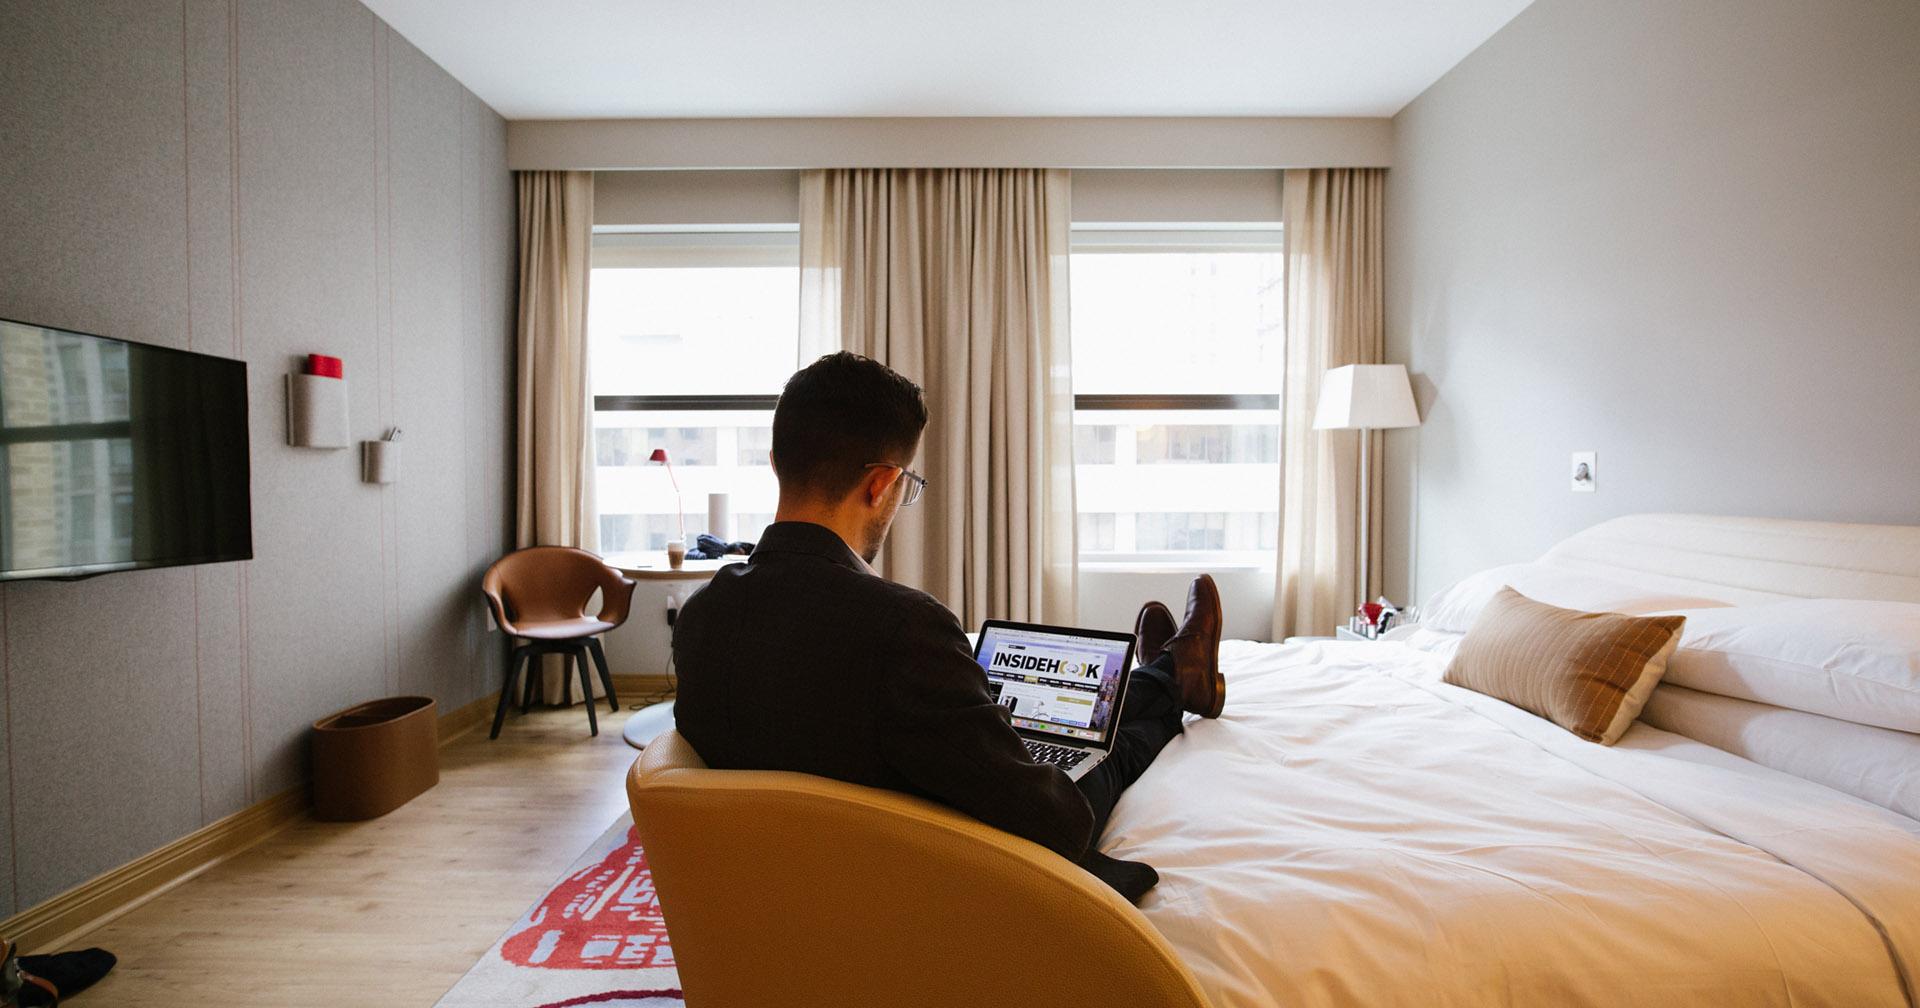 24 Hours in the Virgin Hotel